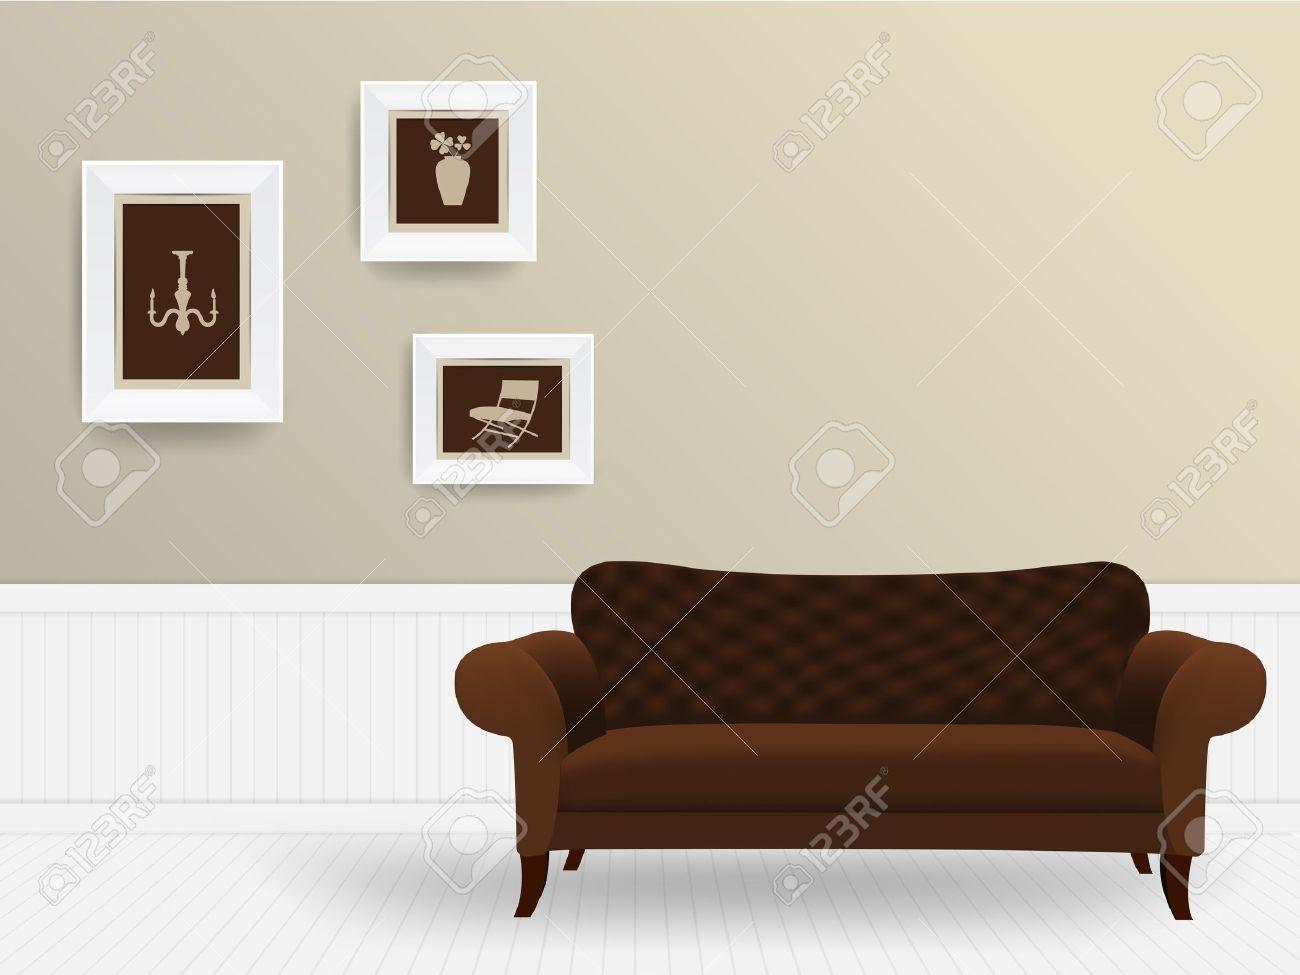 living room interior concept vector illustration modern template